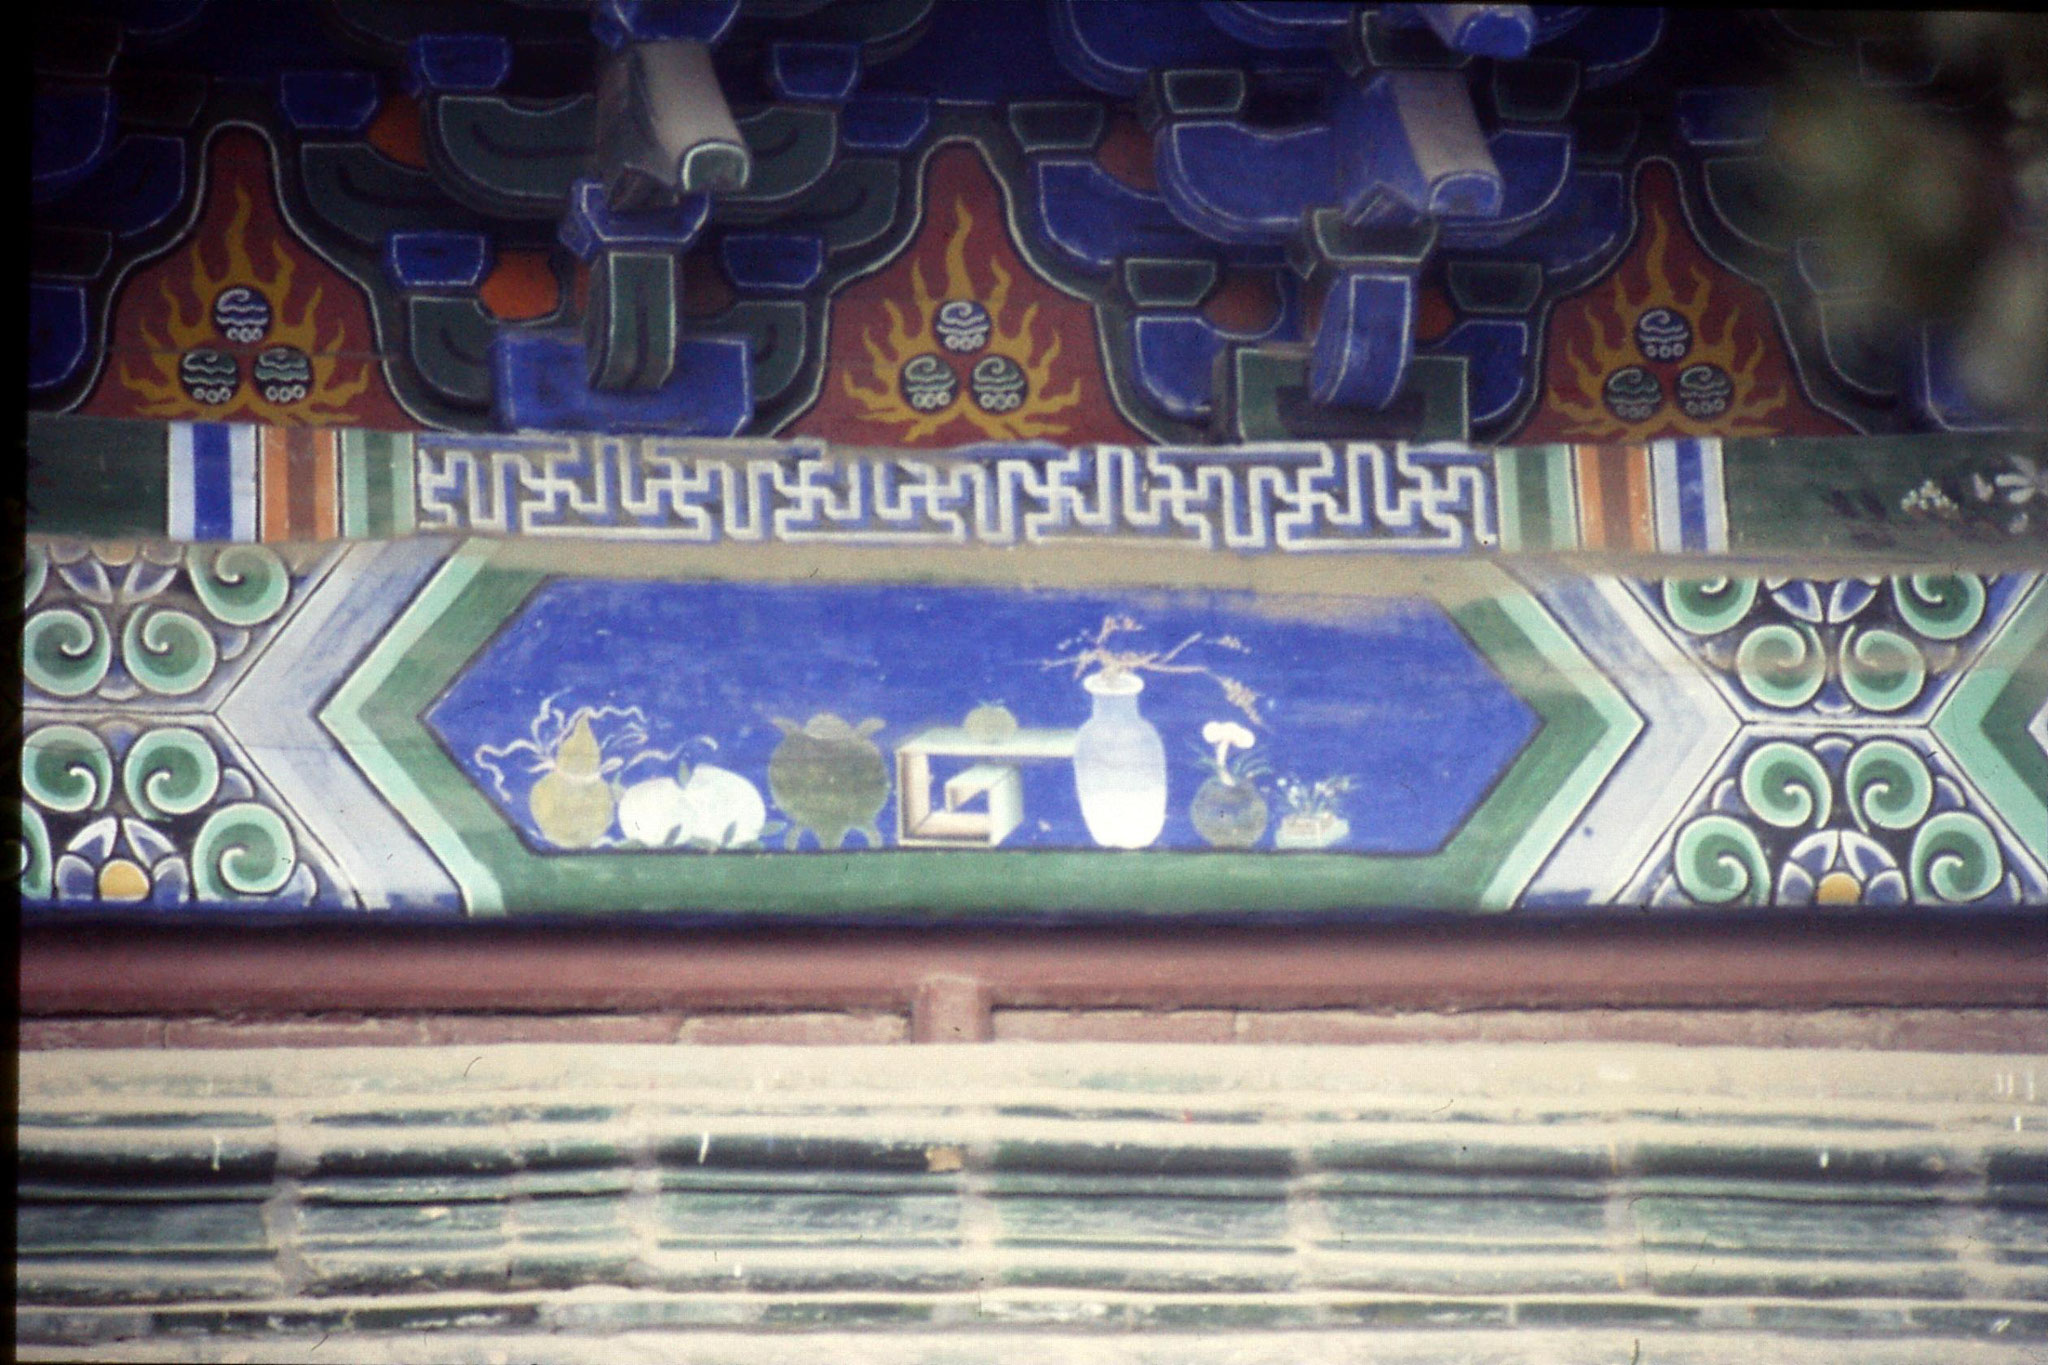 23/2/1989: 6: Qufu, Yan Miao temple